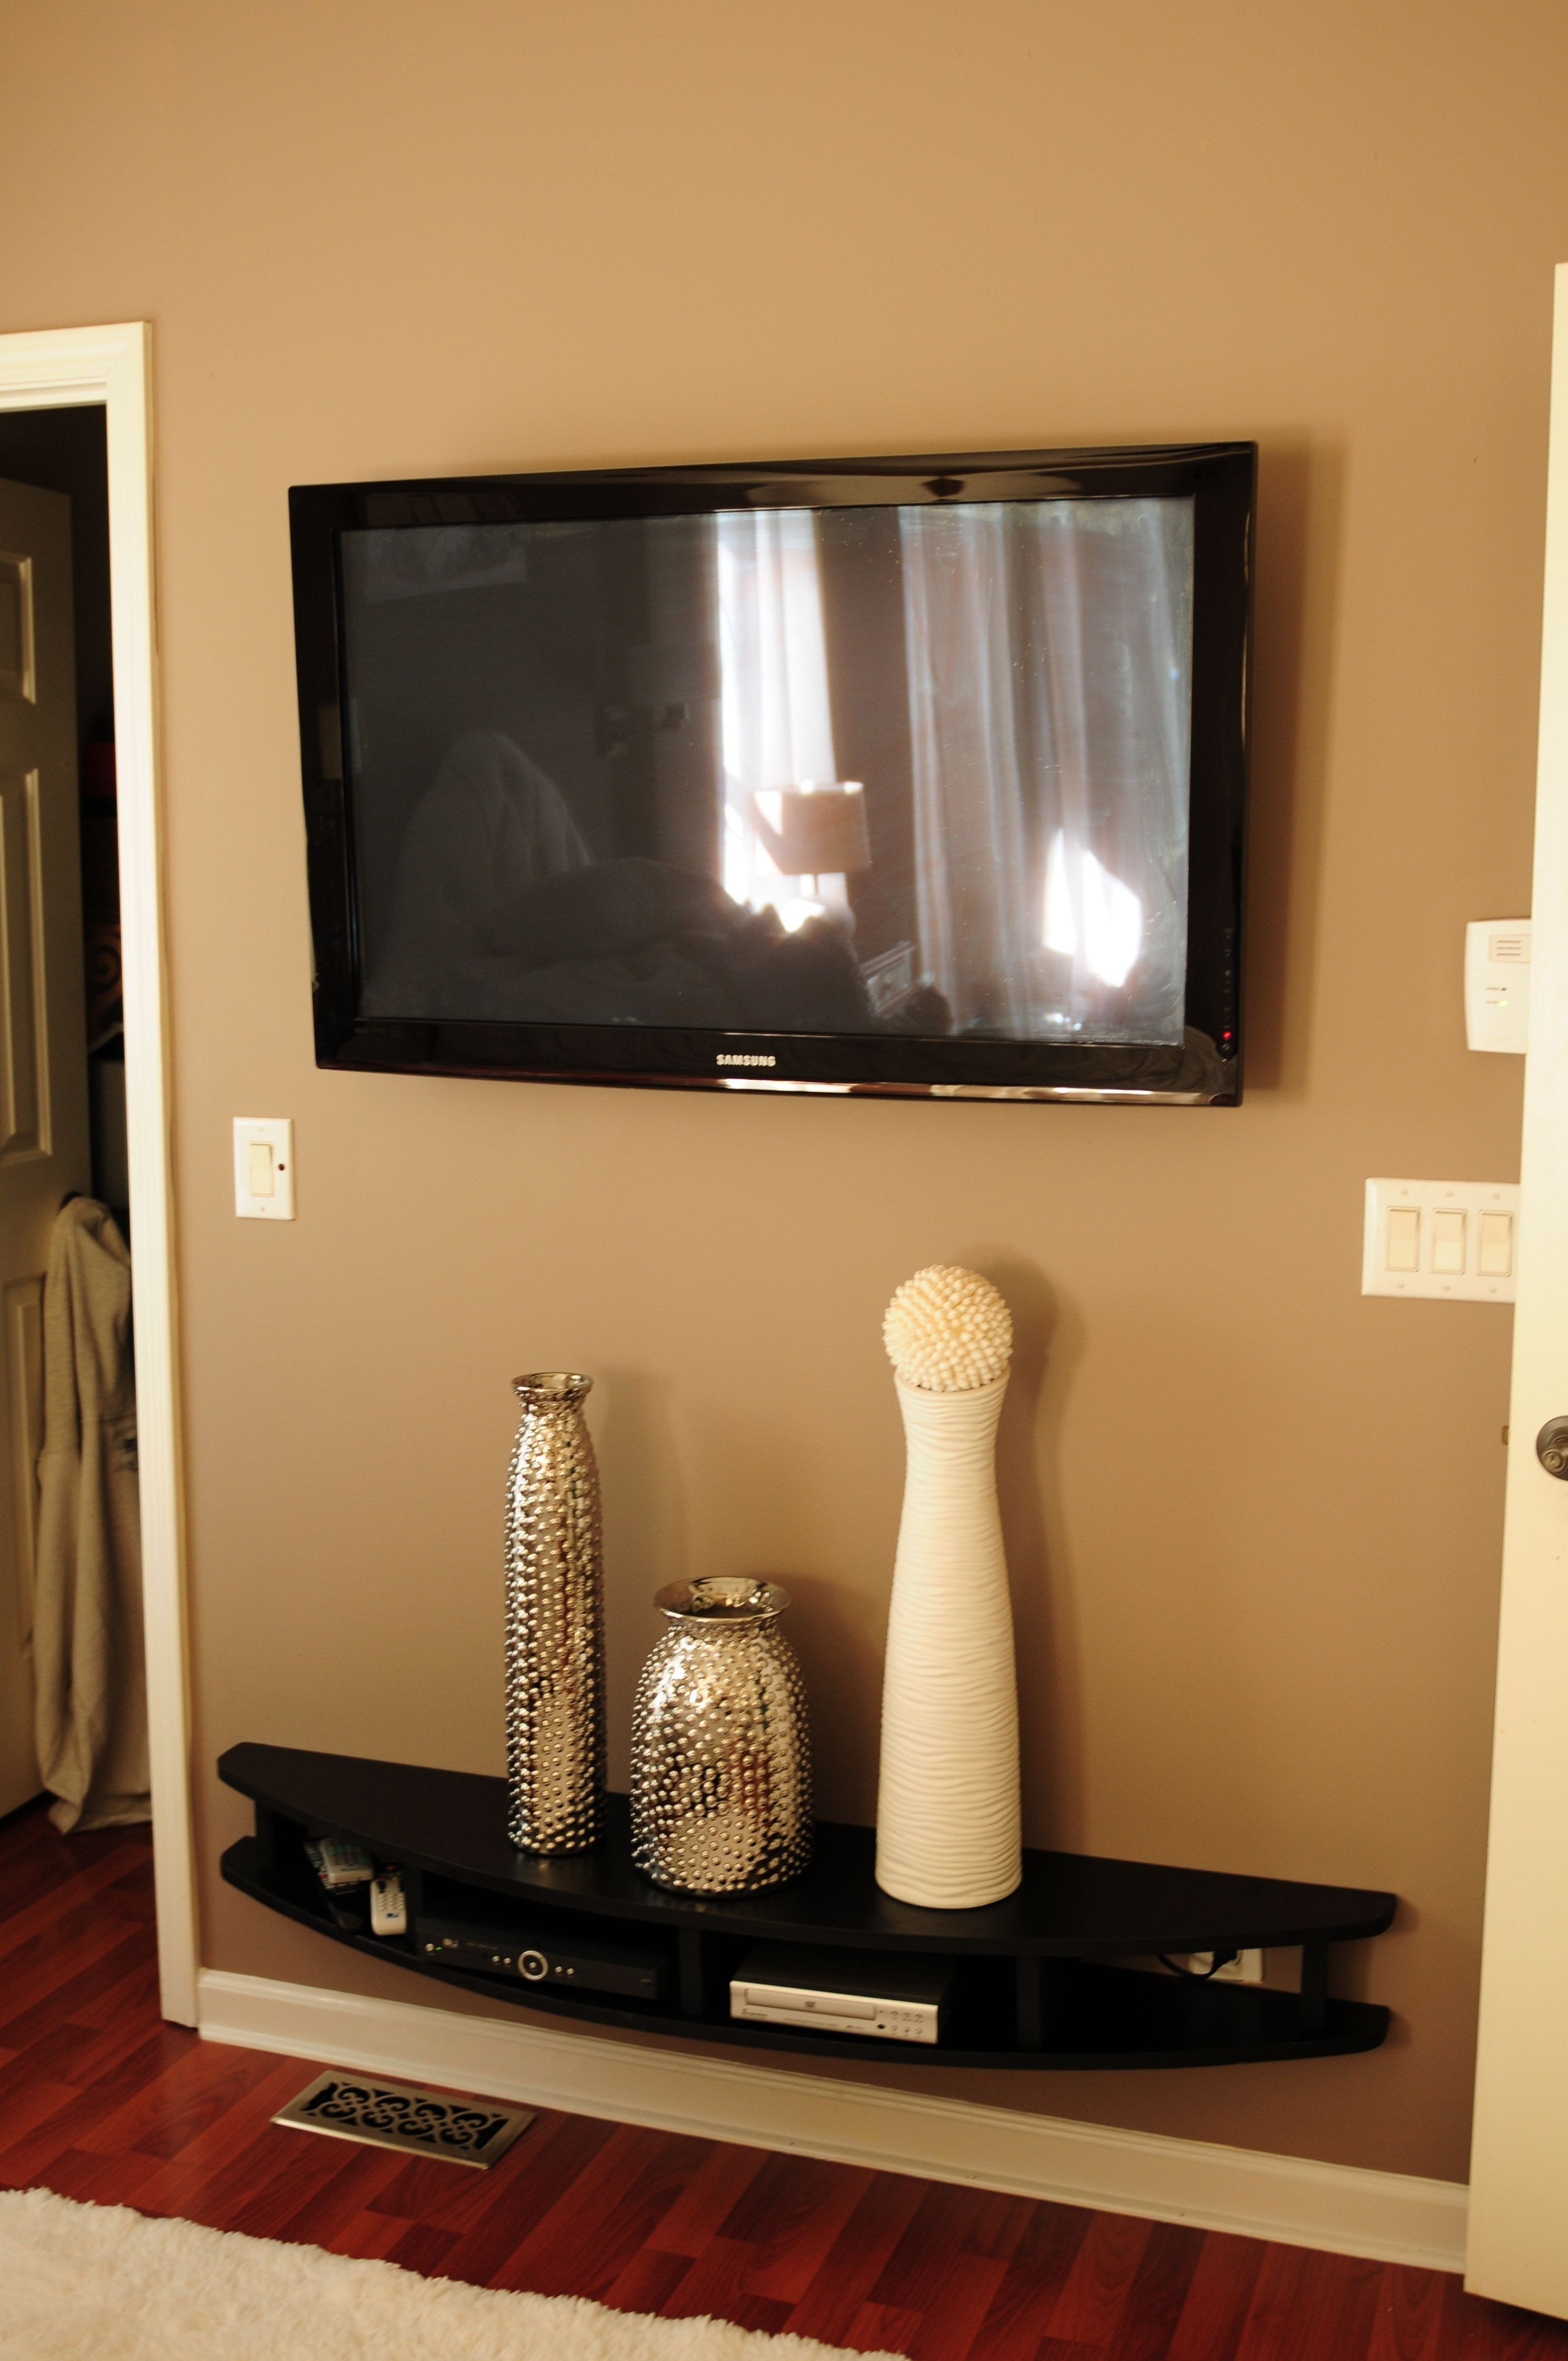 Diy Tv Wall Mount Ideas Fresh 9 Best Tv Wall Mount Ideas For Living Room Tv Wall Shelves Wall Mounted Shelves Wall Decor Living Room